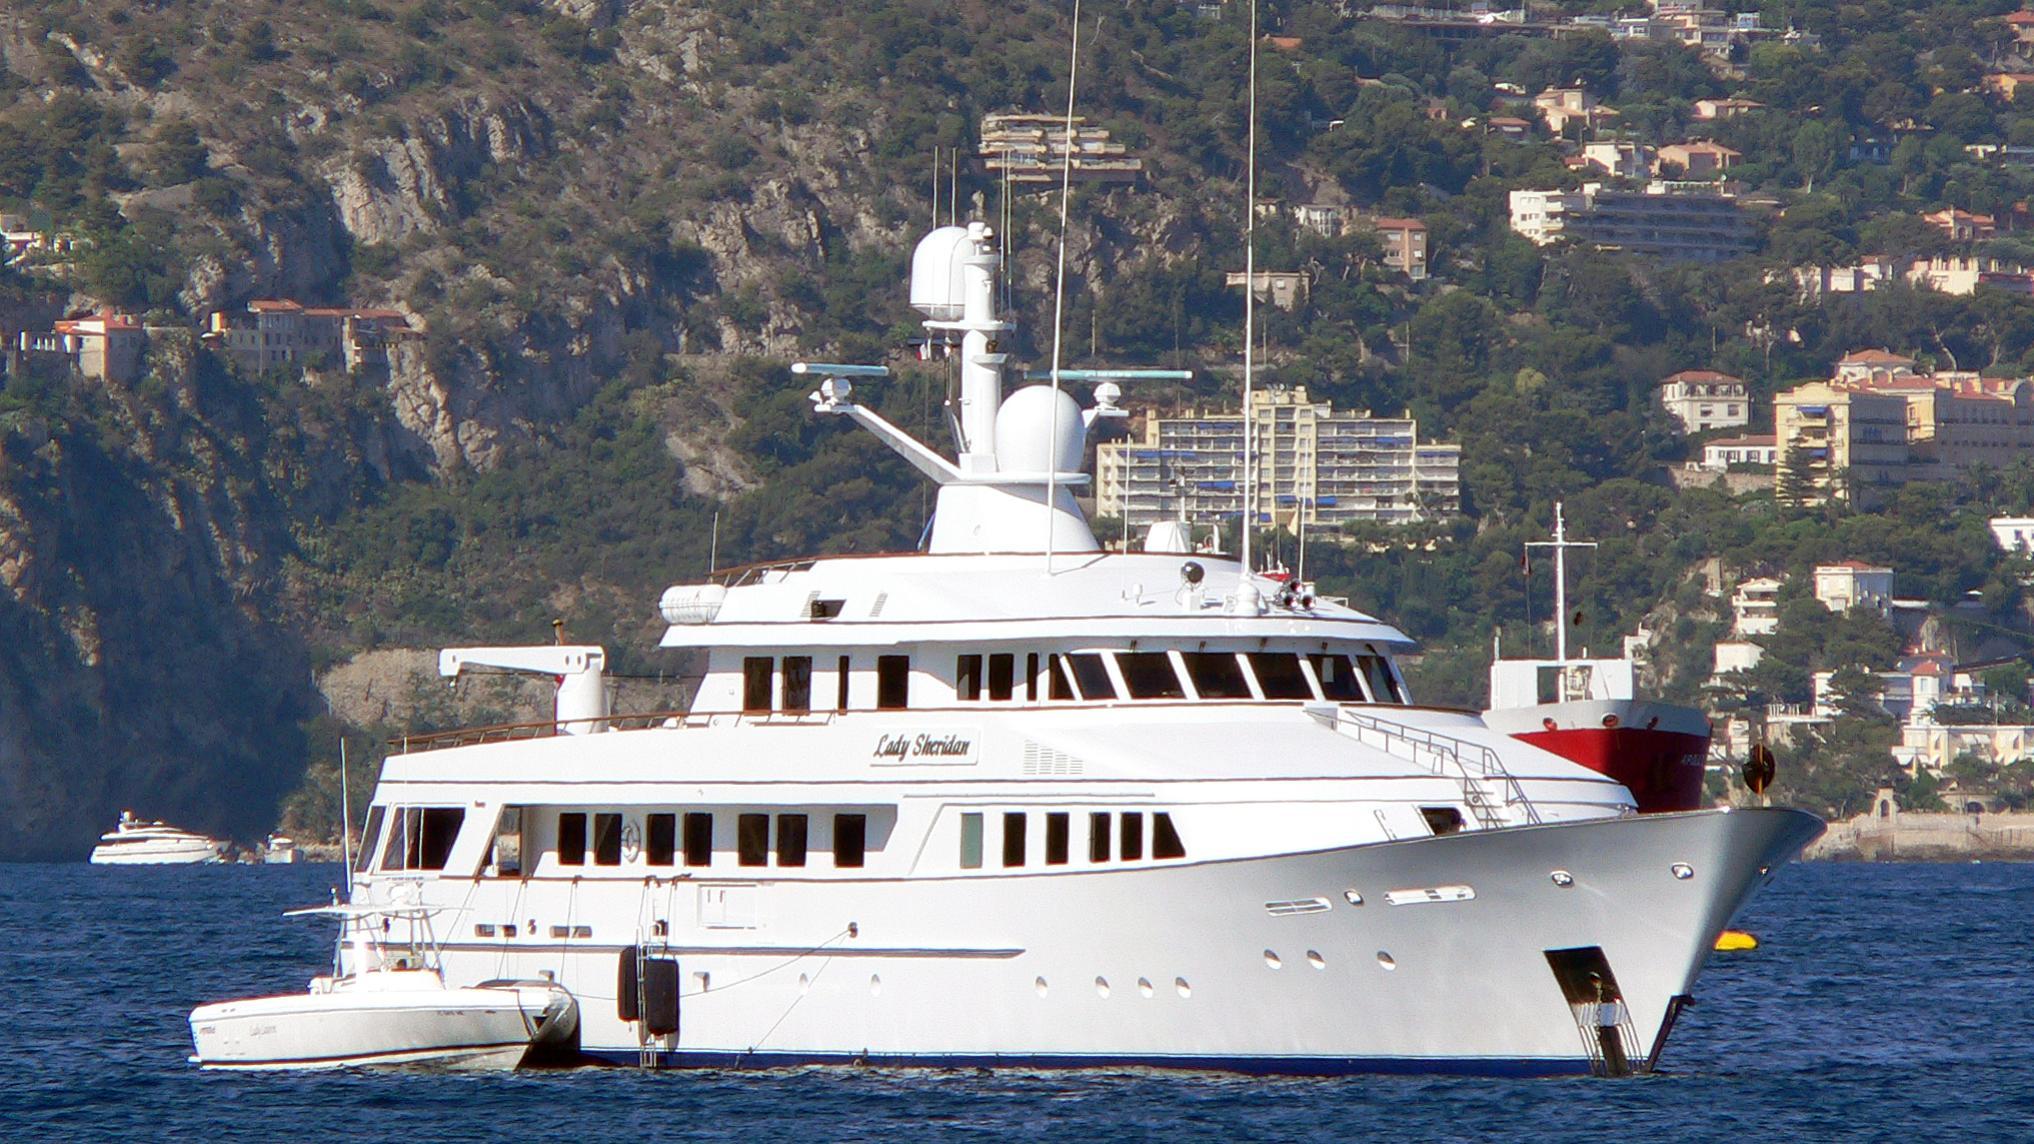 athina-ii-motor-yacht-feadship-1988-45m-half-profile